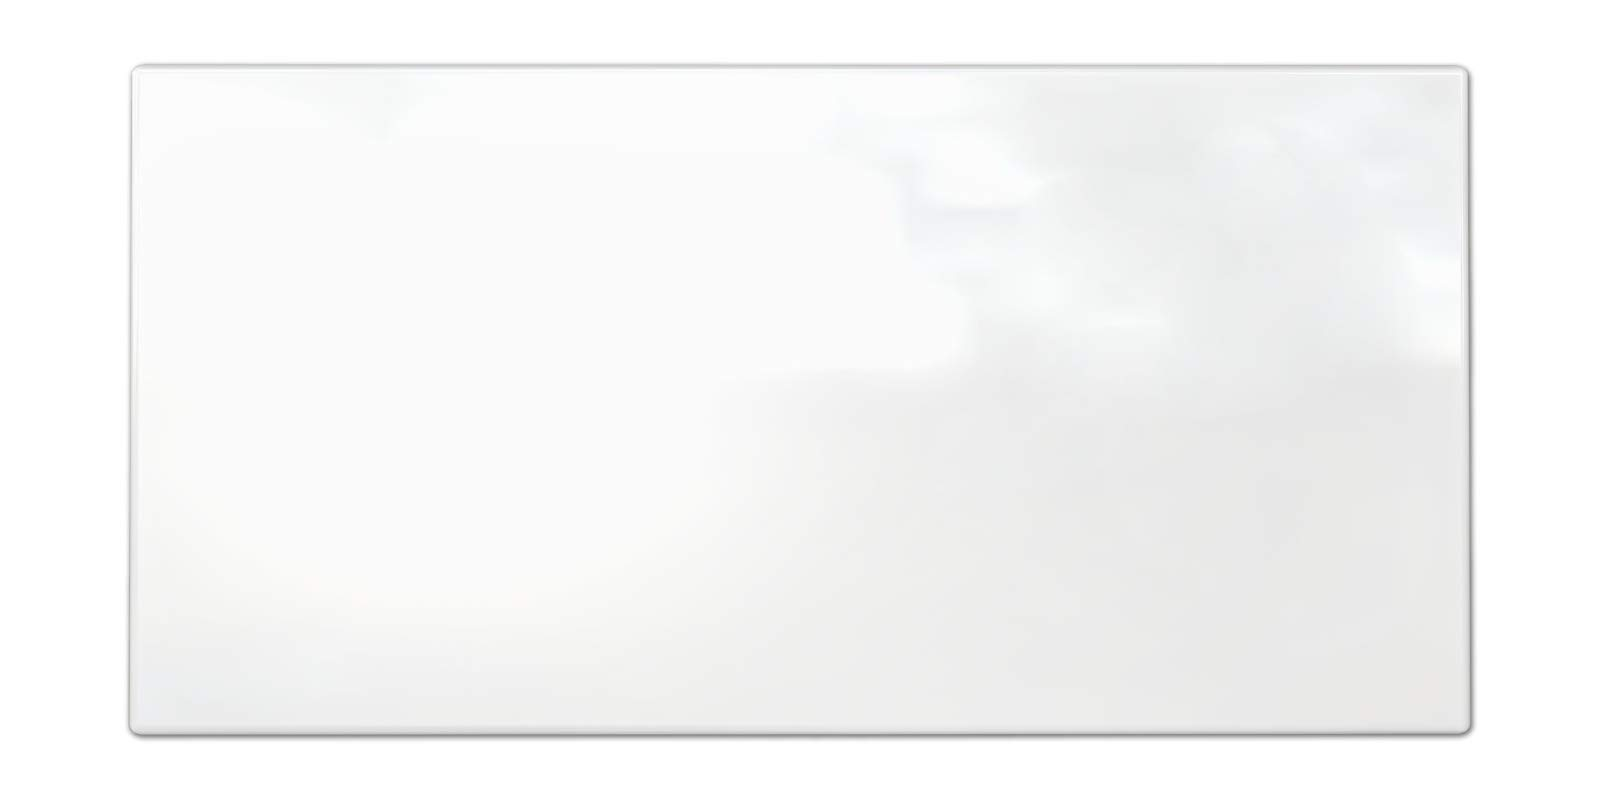 3x6 Snow White Glossy Finish Ceramic Subway Tile Shower Walls Backsplashes (80pcs Box)